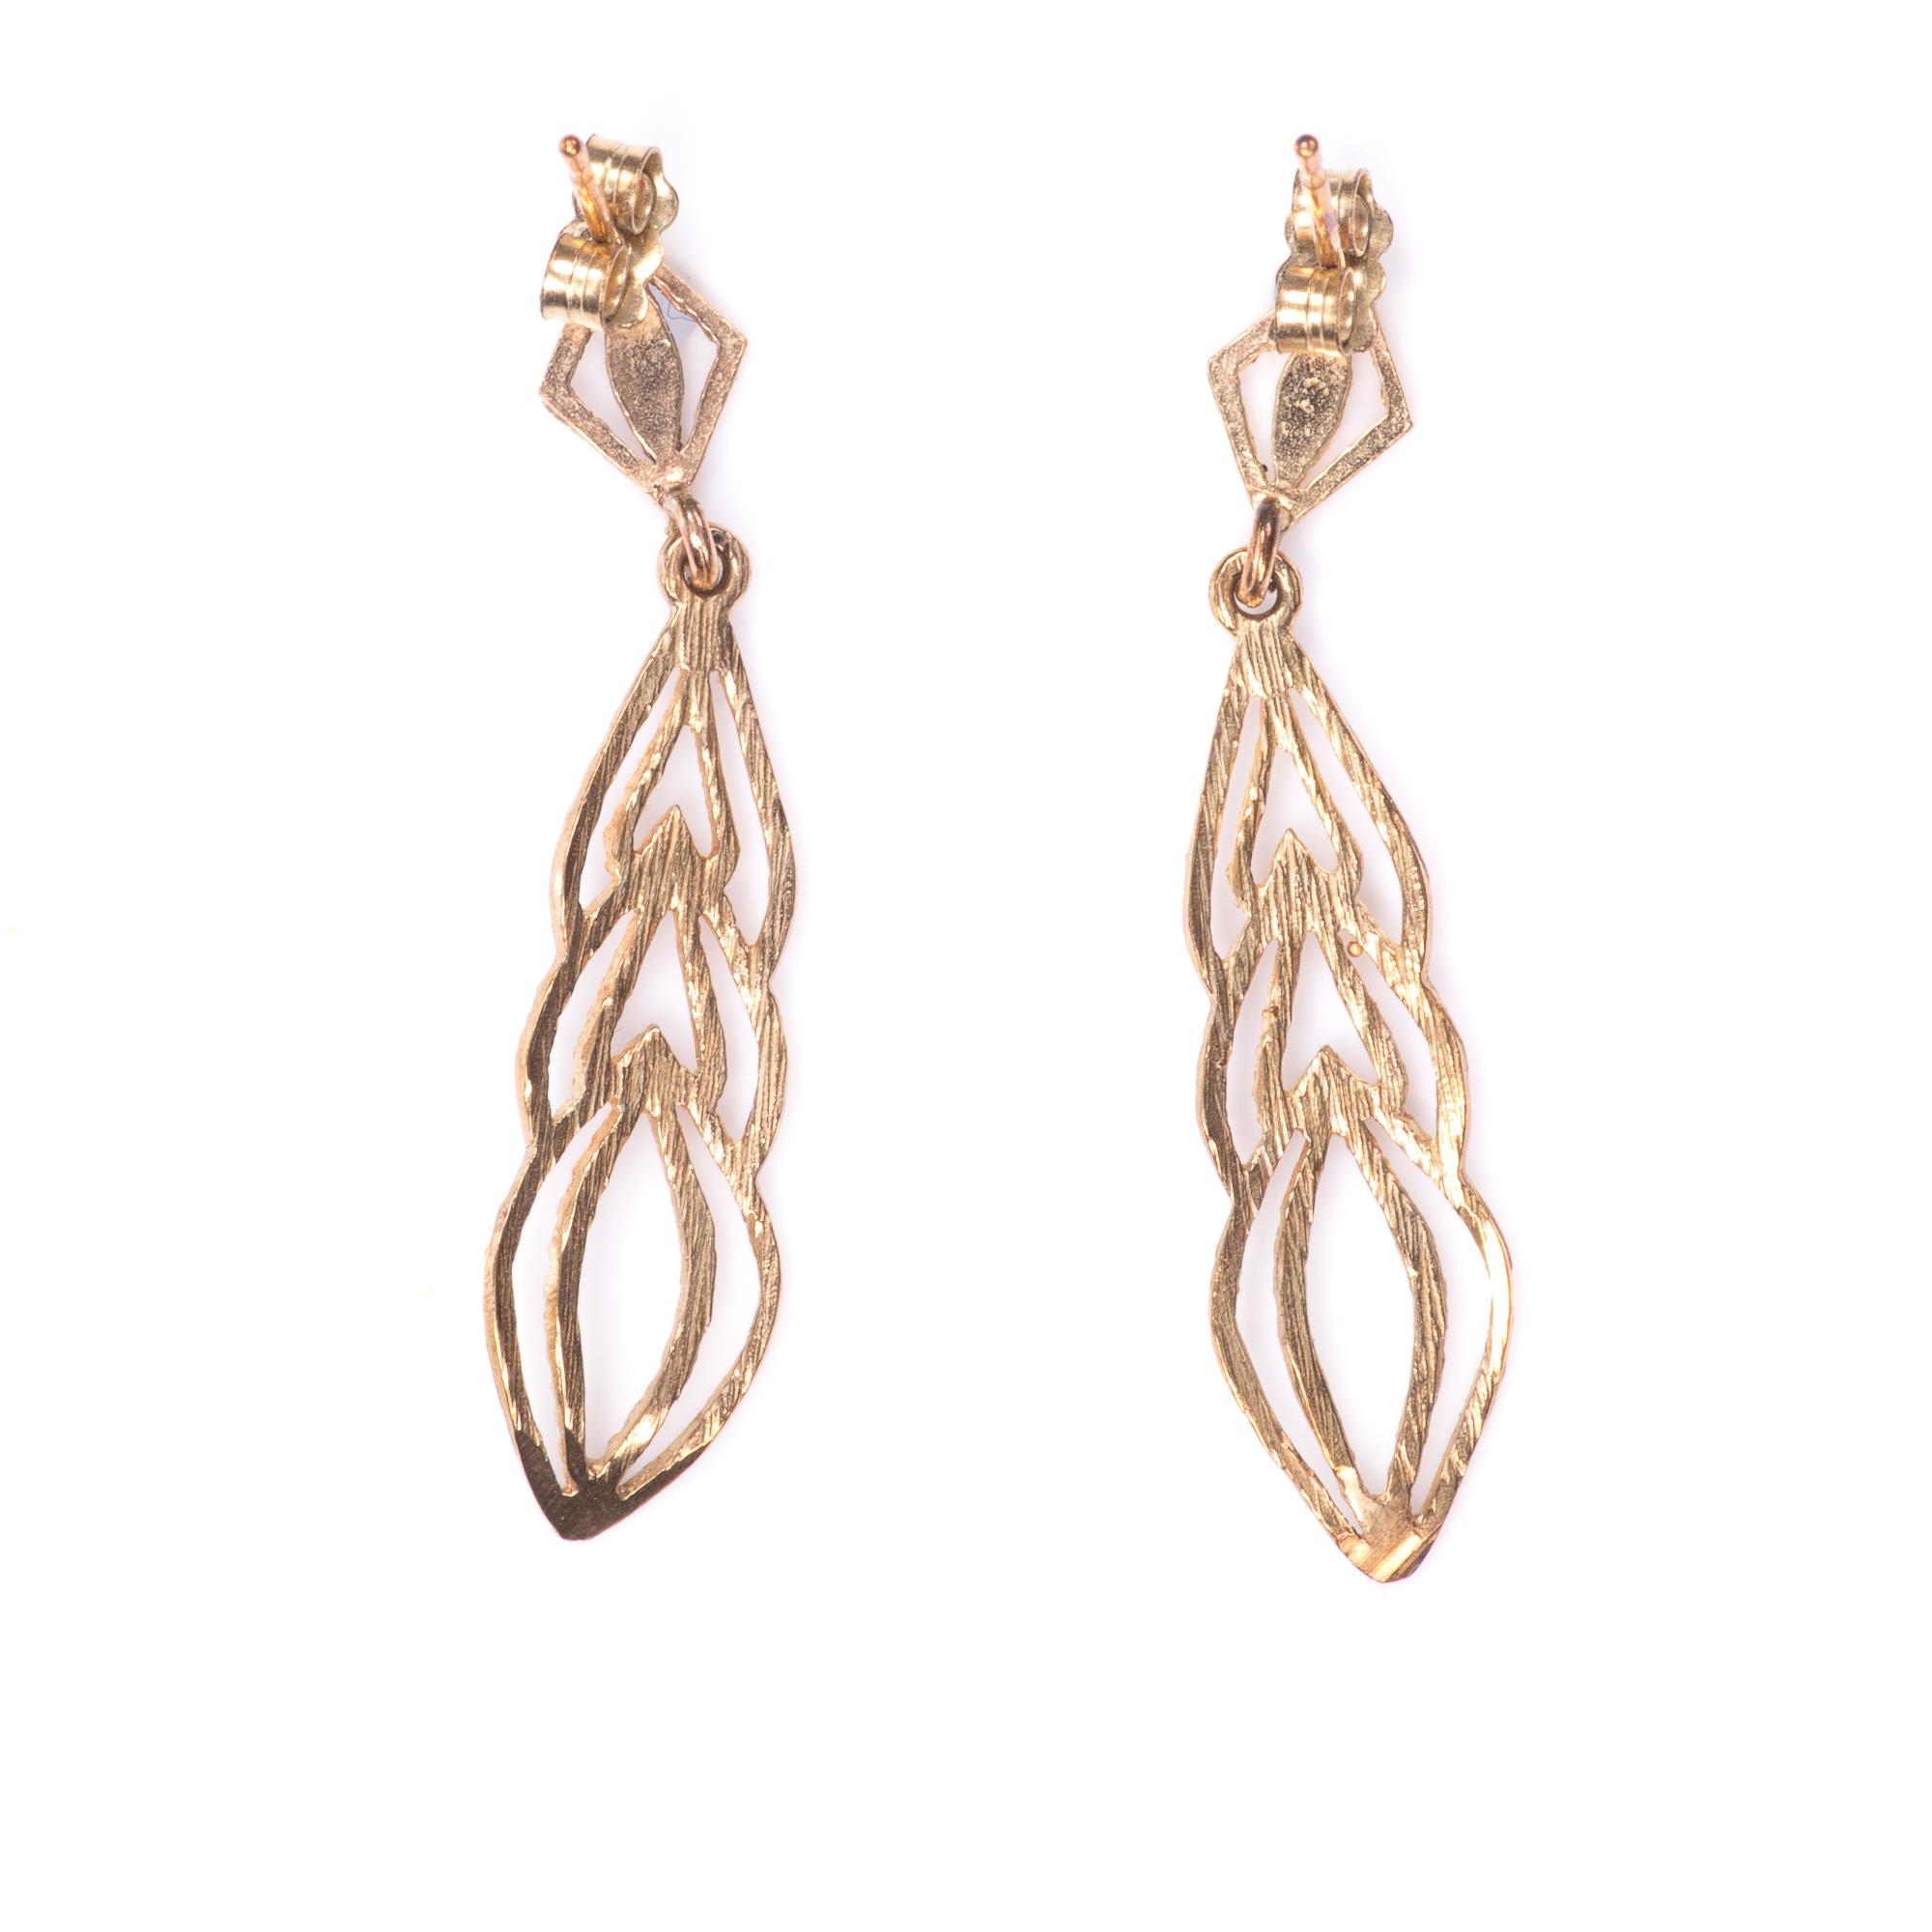 9ct Gold Filigree Earrings